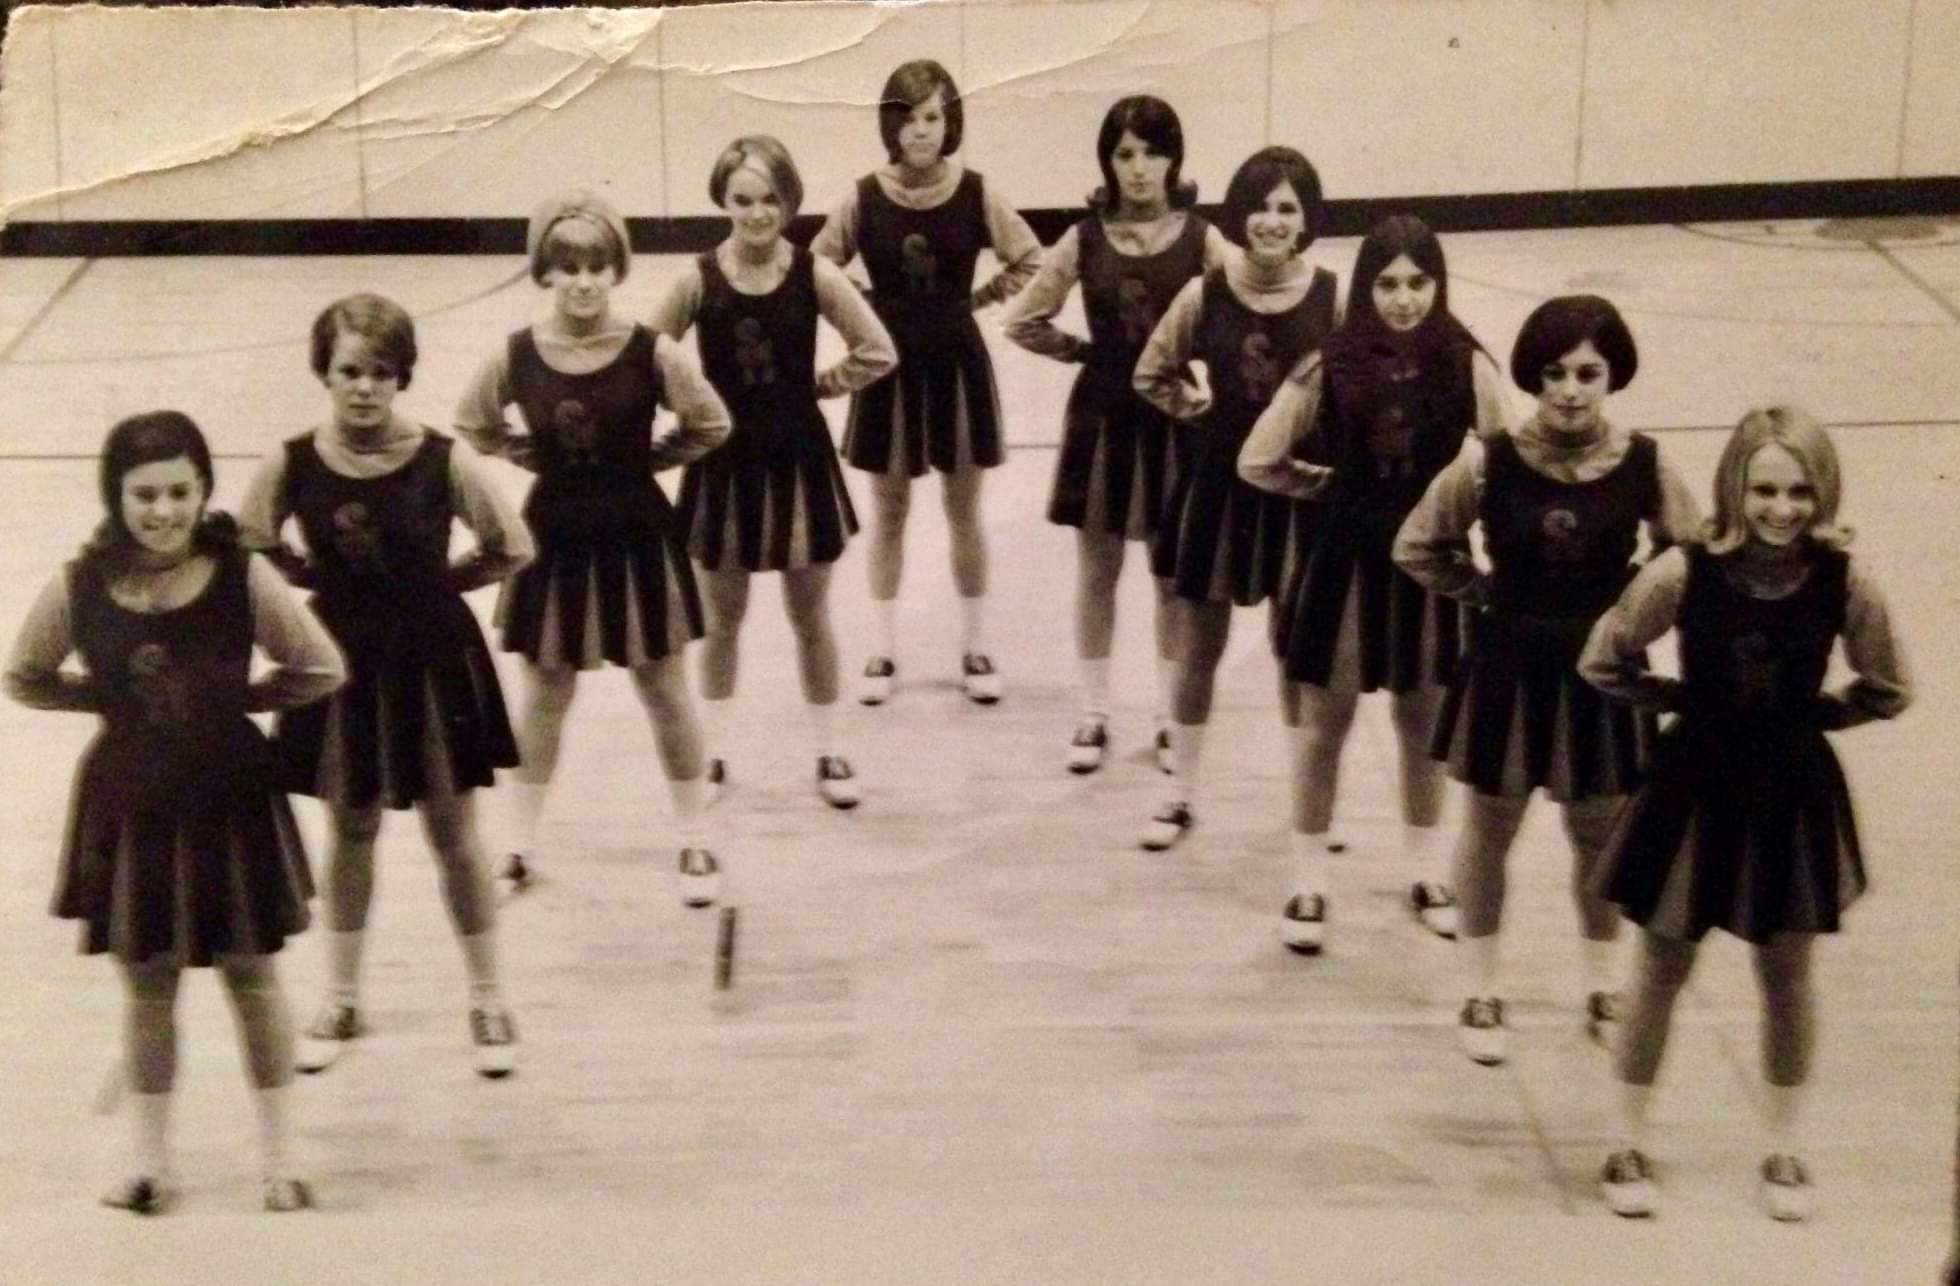 Carol's junior year cheerleader photo. Look for the knees...